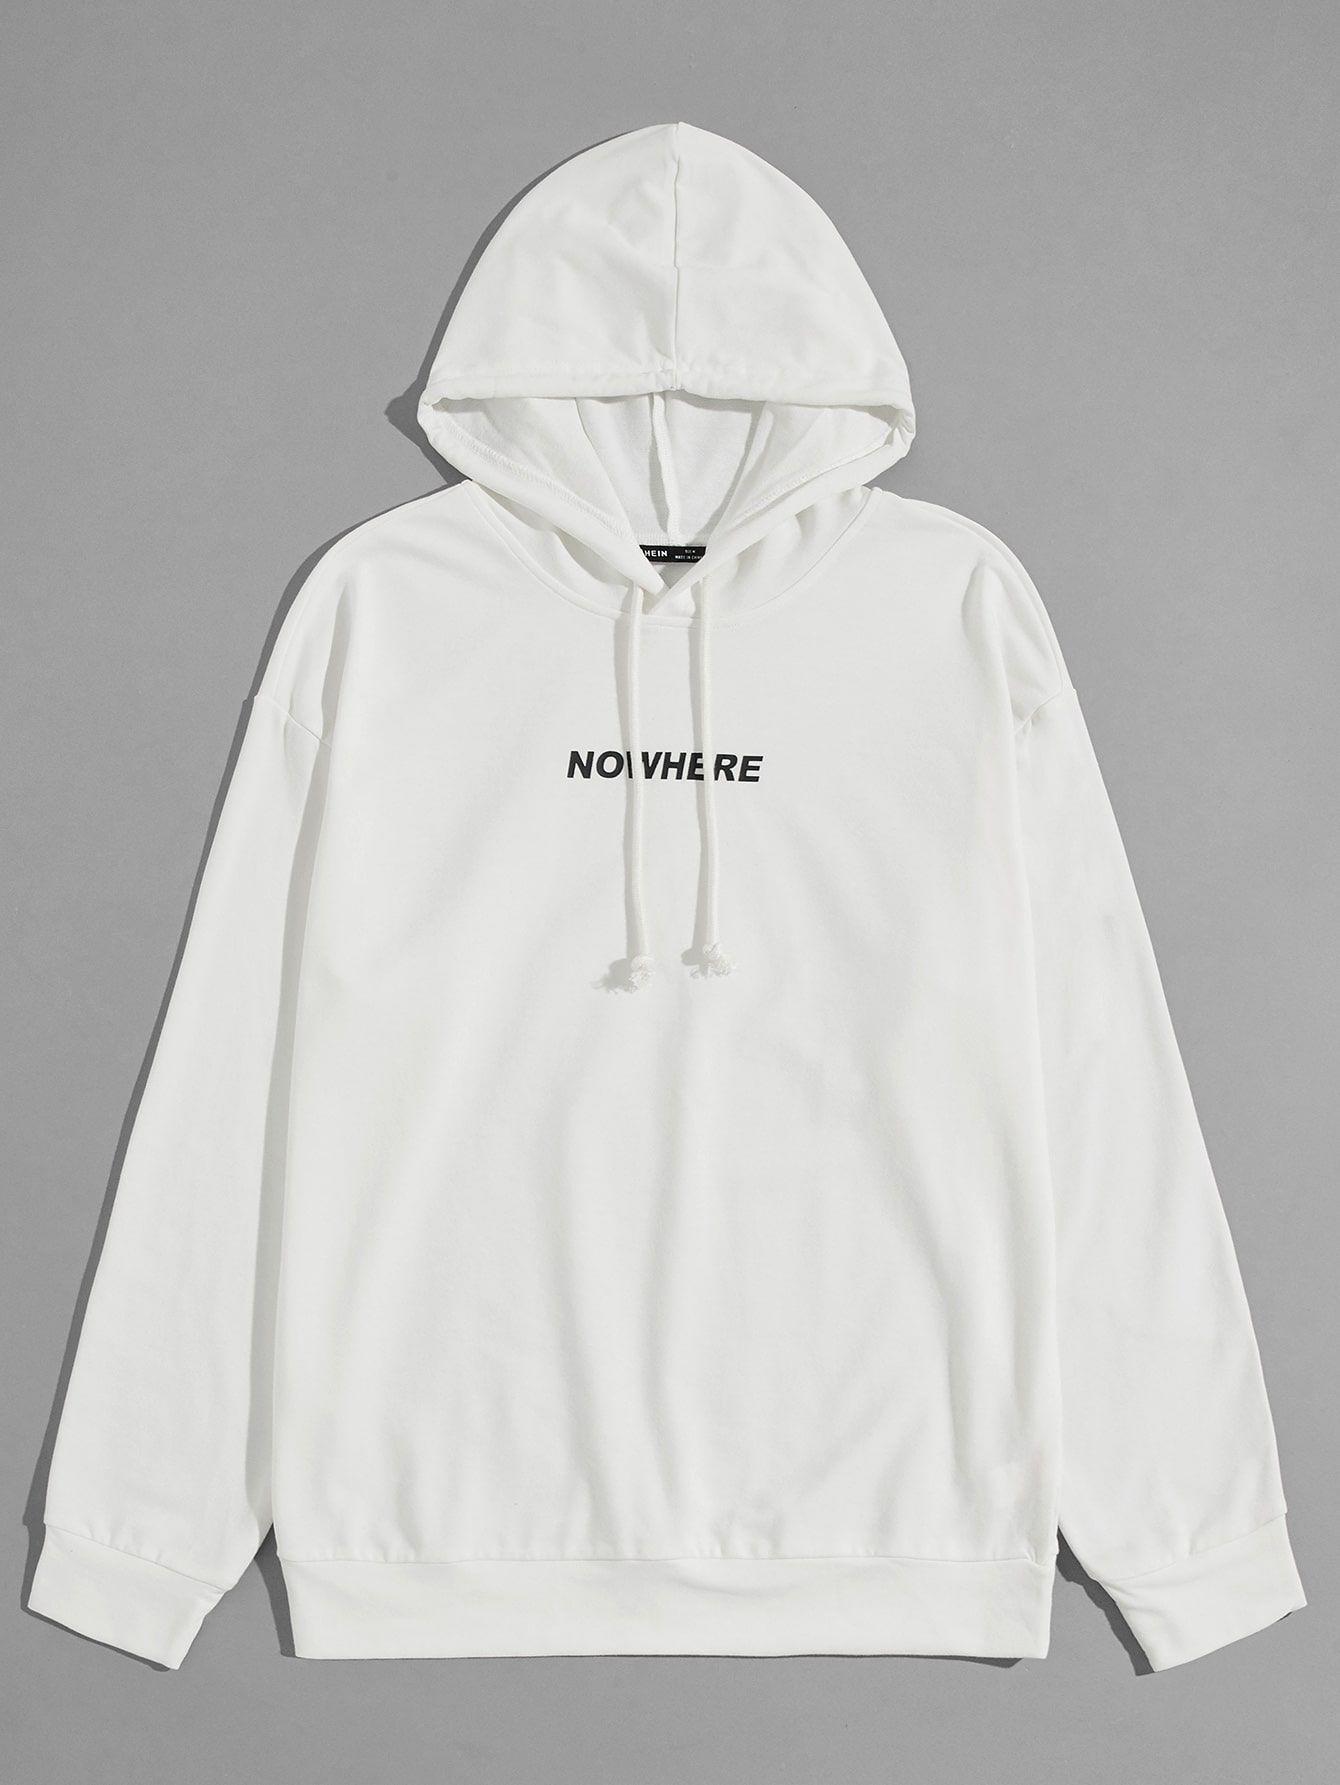 Men Letter Graphic Drawstring Hoodie Shein Usa In 2021 Printed Sweatshirts Hoodies Hoodie Outfit Men [ 1785 x 1340 Pixel ]